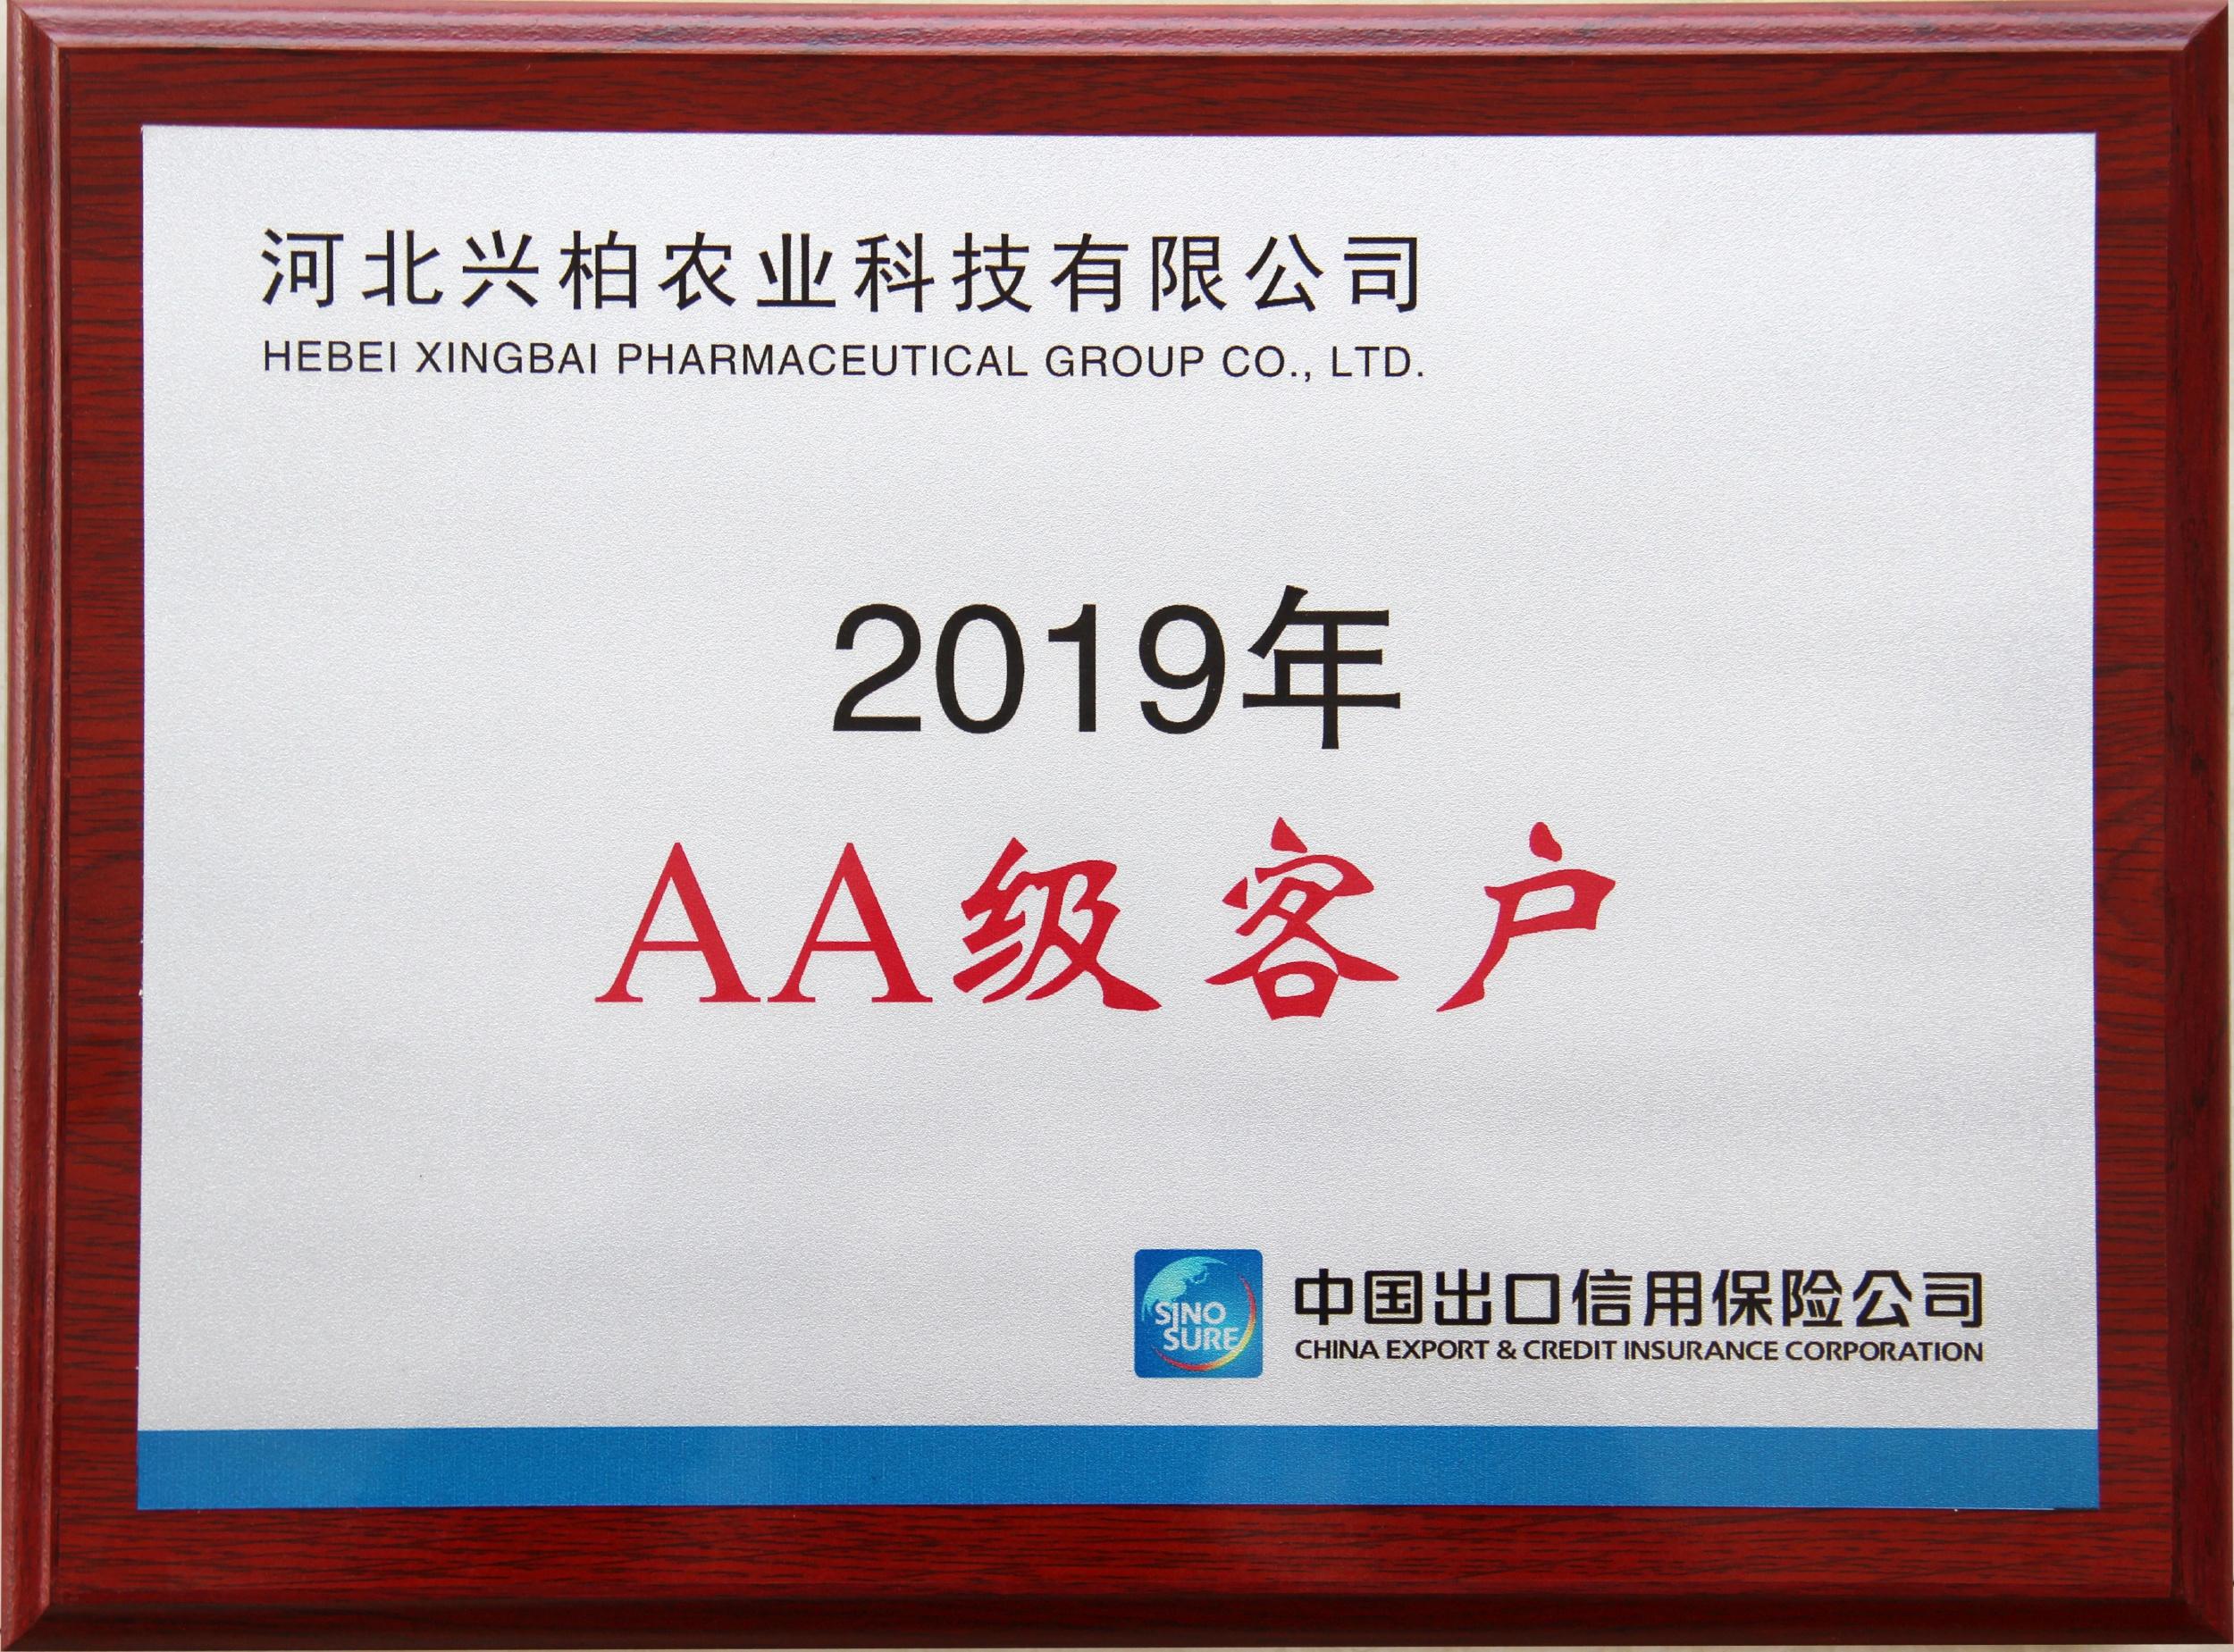 Cliente de clase AA de corporación de seguros de crédito de exportación de China 2019